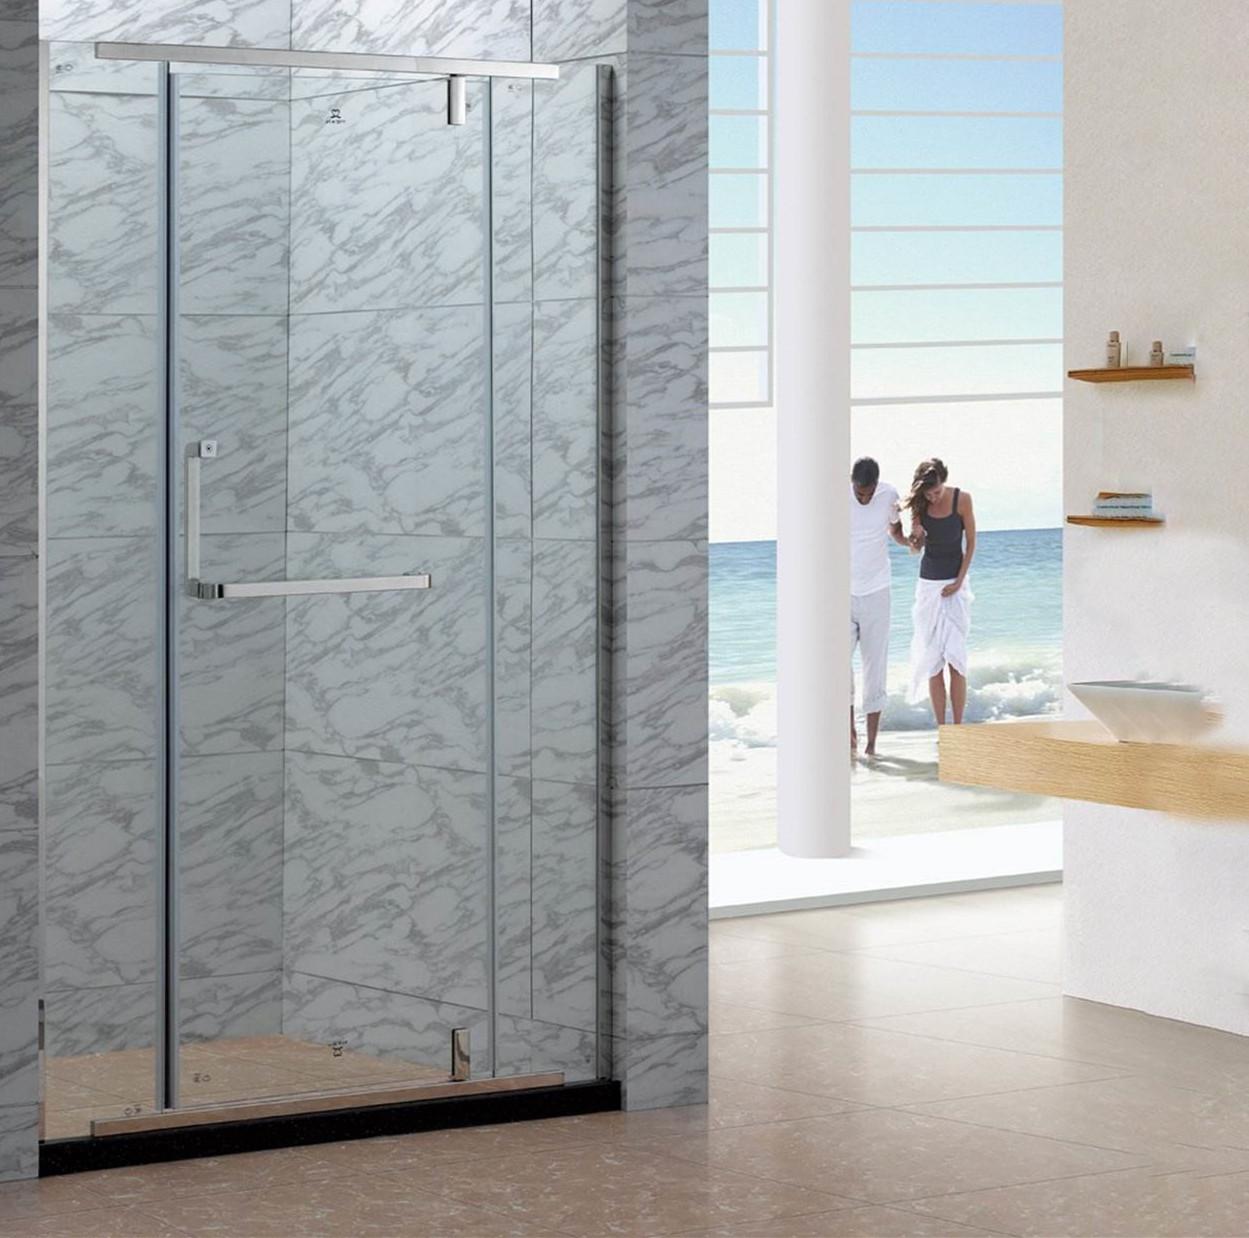 Shower room classification